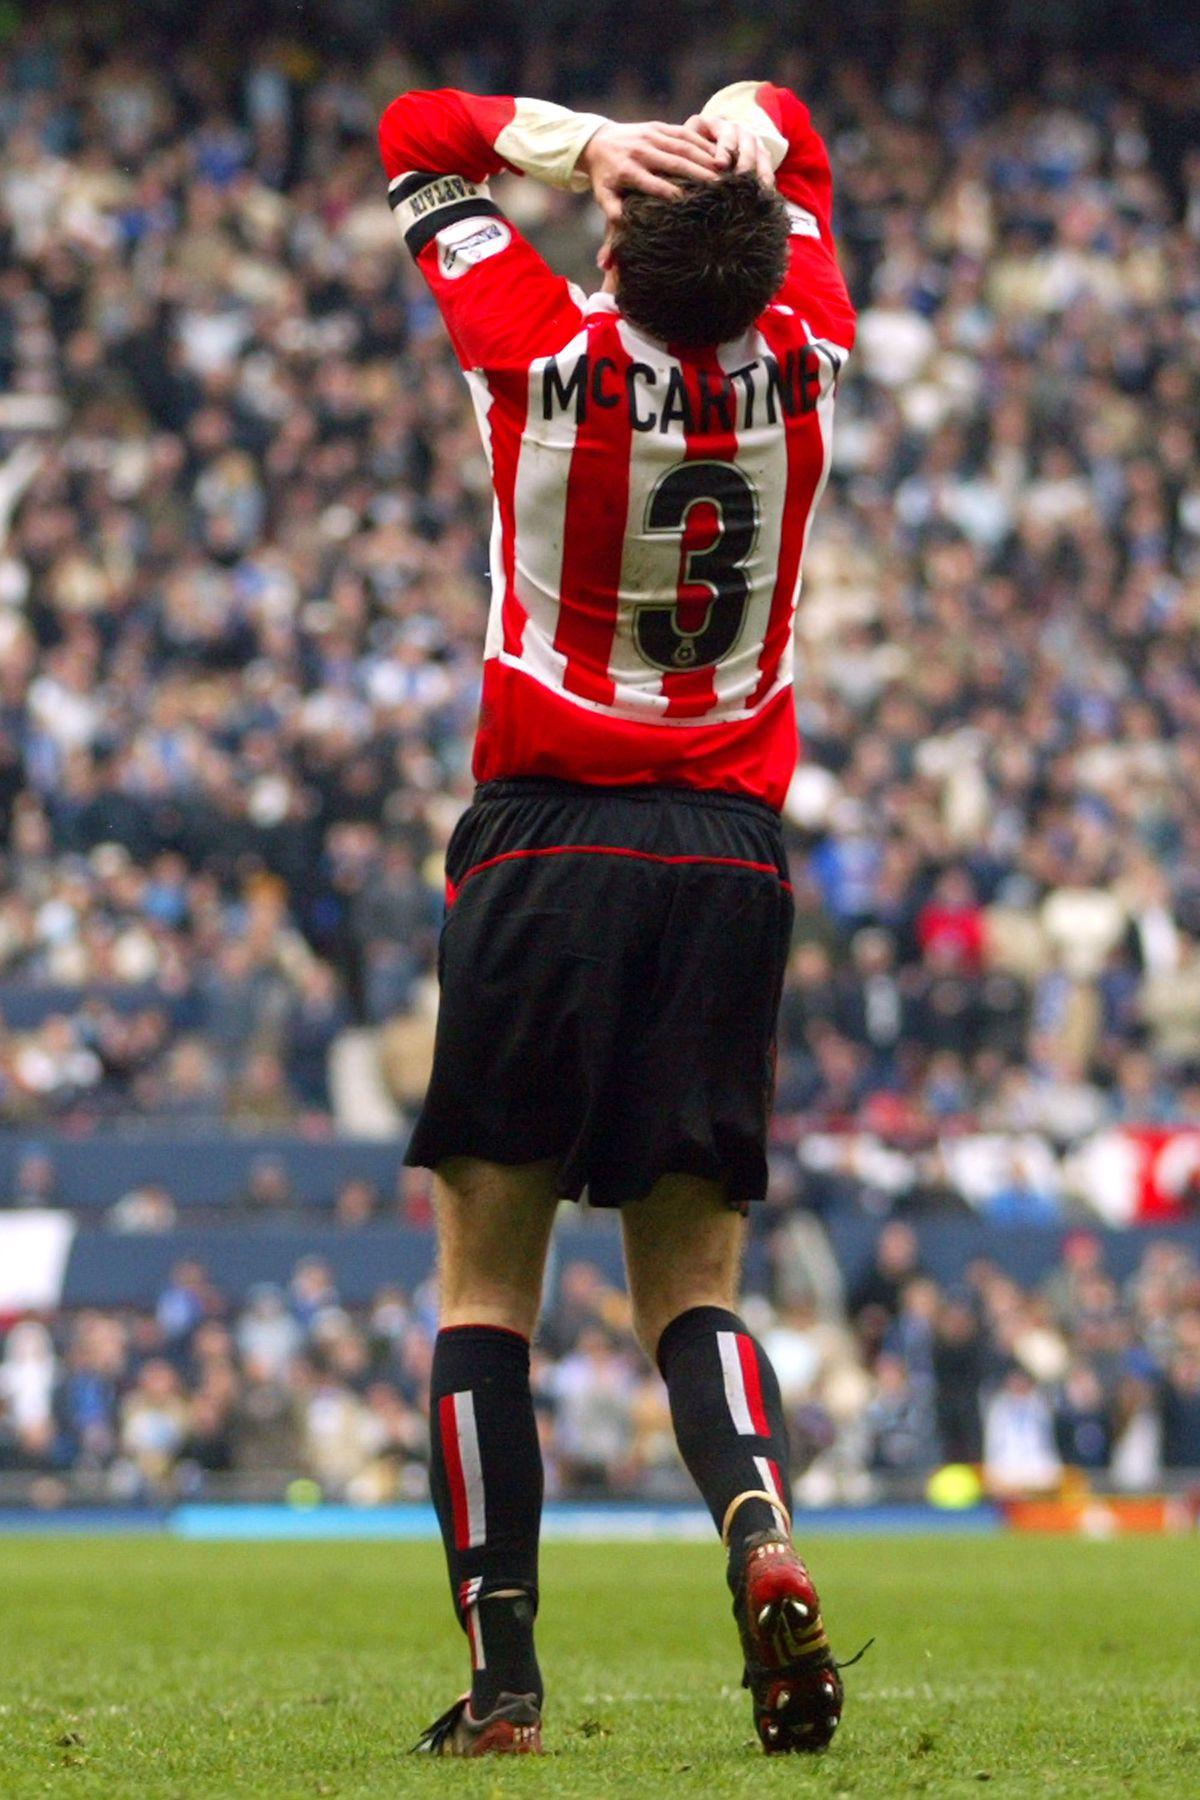 Soccer - AXA FA Cup - Semi Final - Sunderland v Millwall